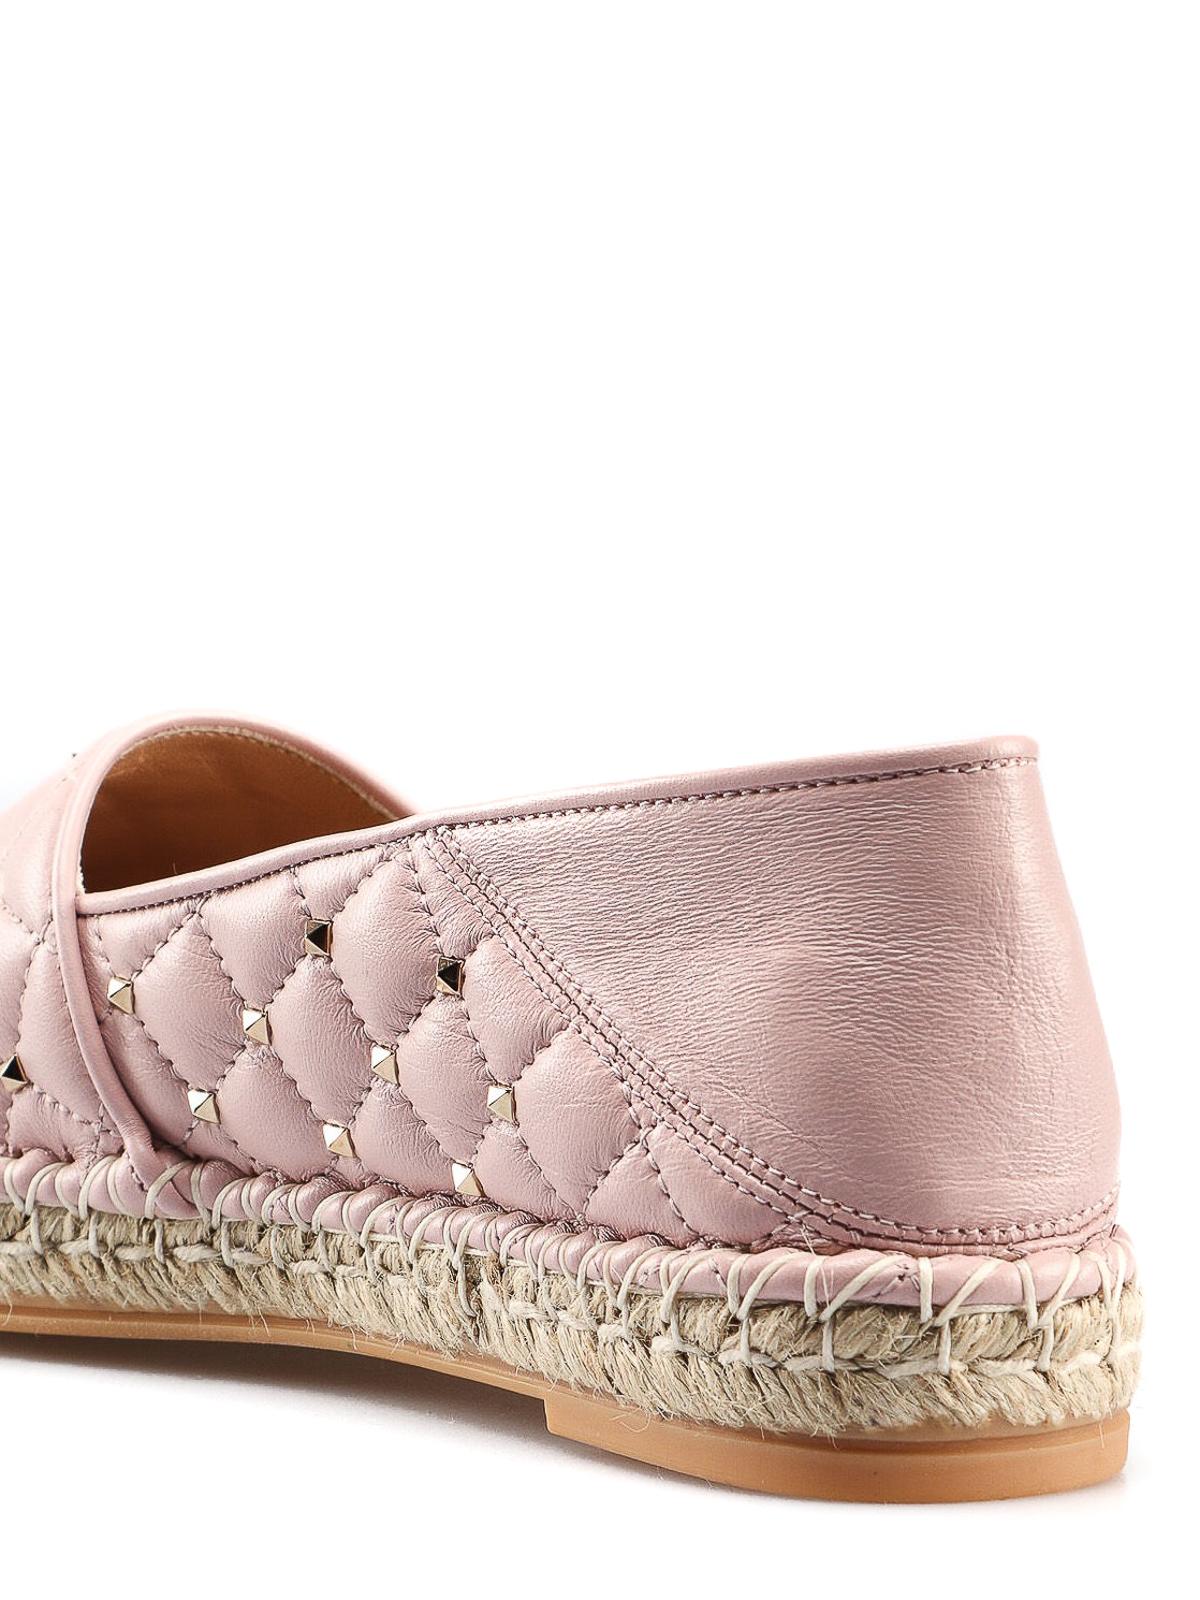 f1d6ca47f Rockstud light pink leather espadrilles shop online: VALENTINO GARAVANI